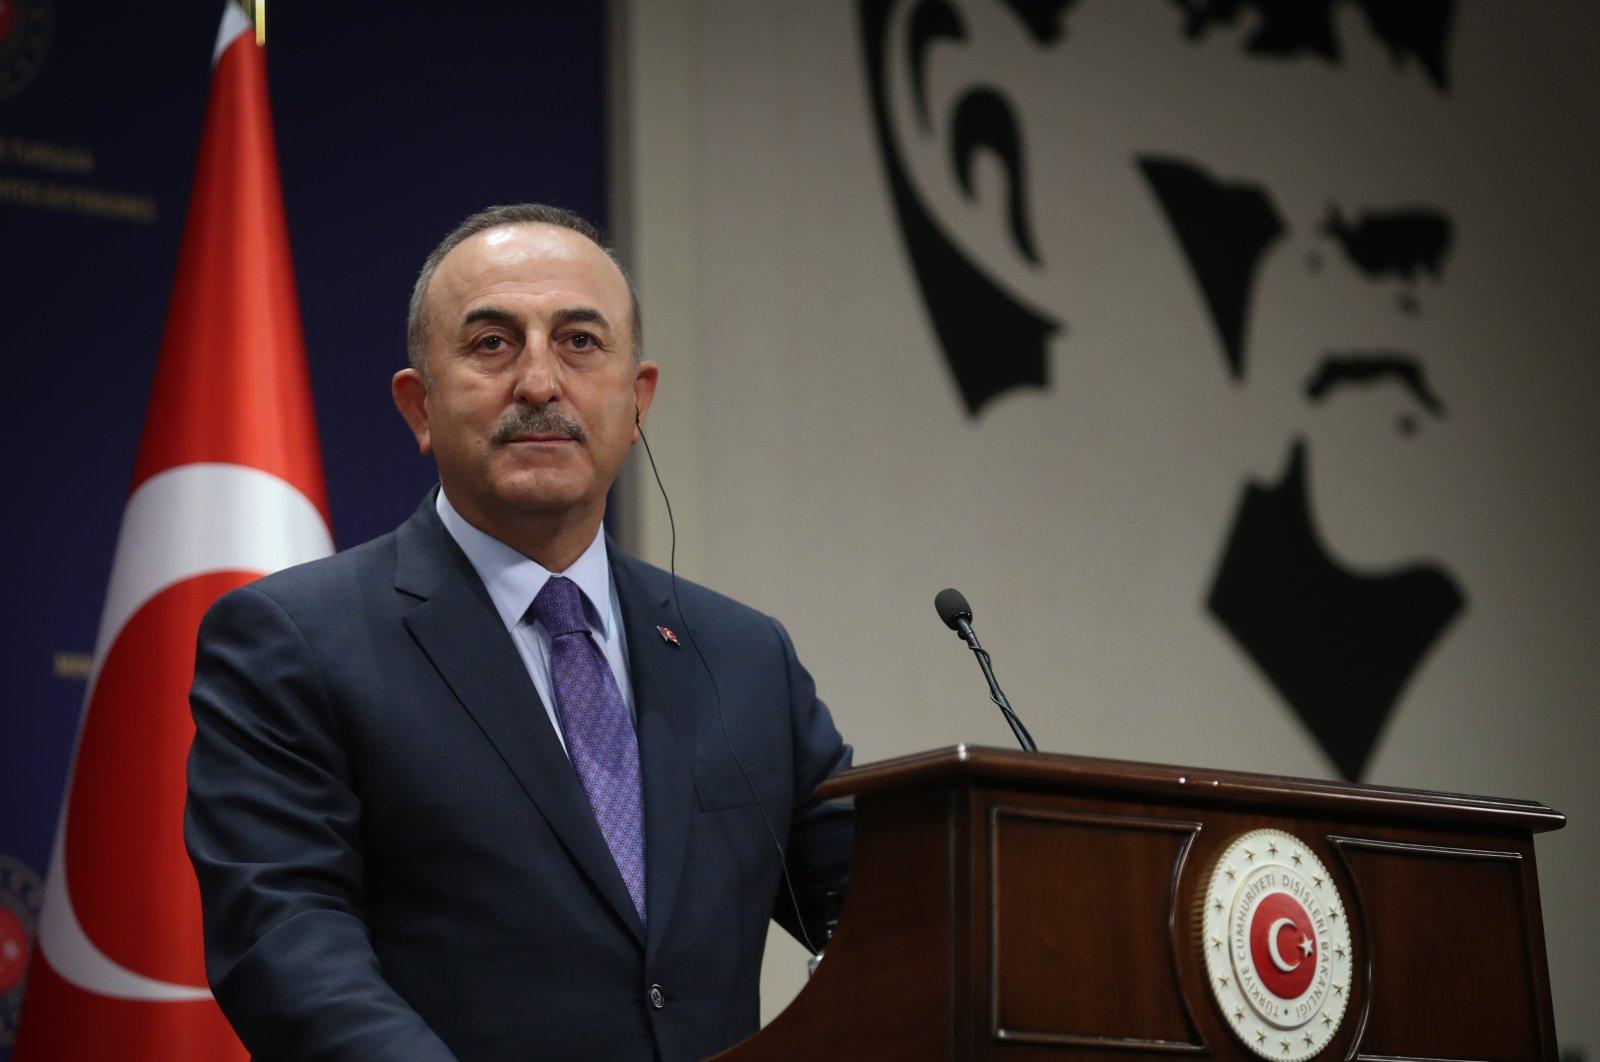 Turkish Foreign Minister Mevlüt Çavuşoğlu speaks during a press conference in Ankara, Turkey, May 3, 2021. (AA photo)